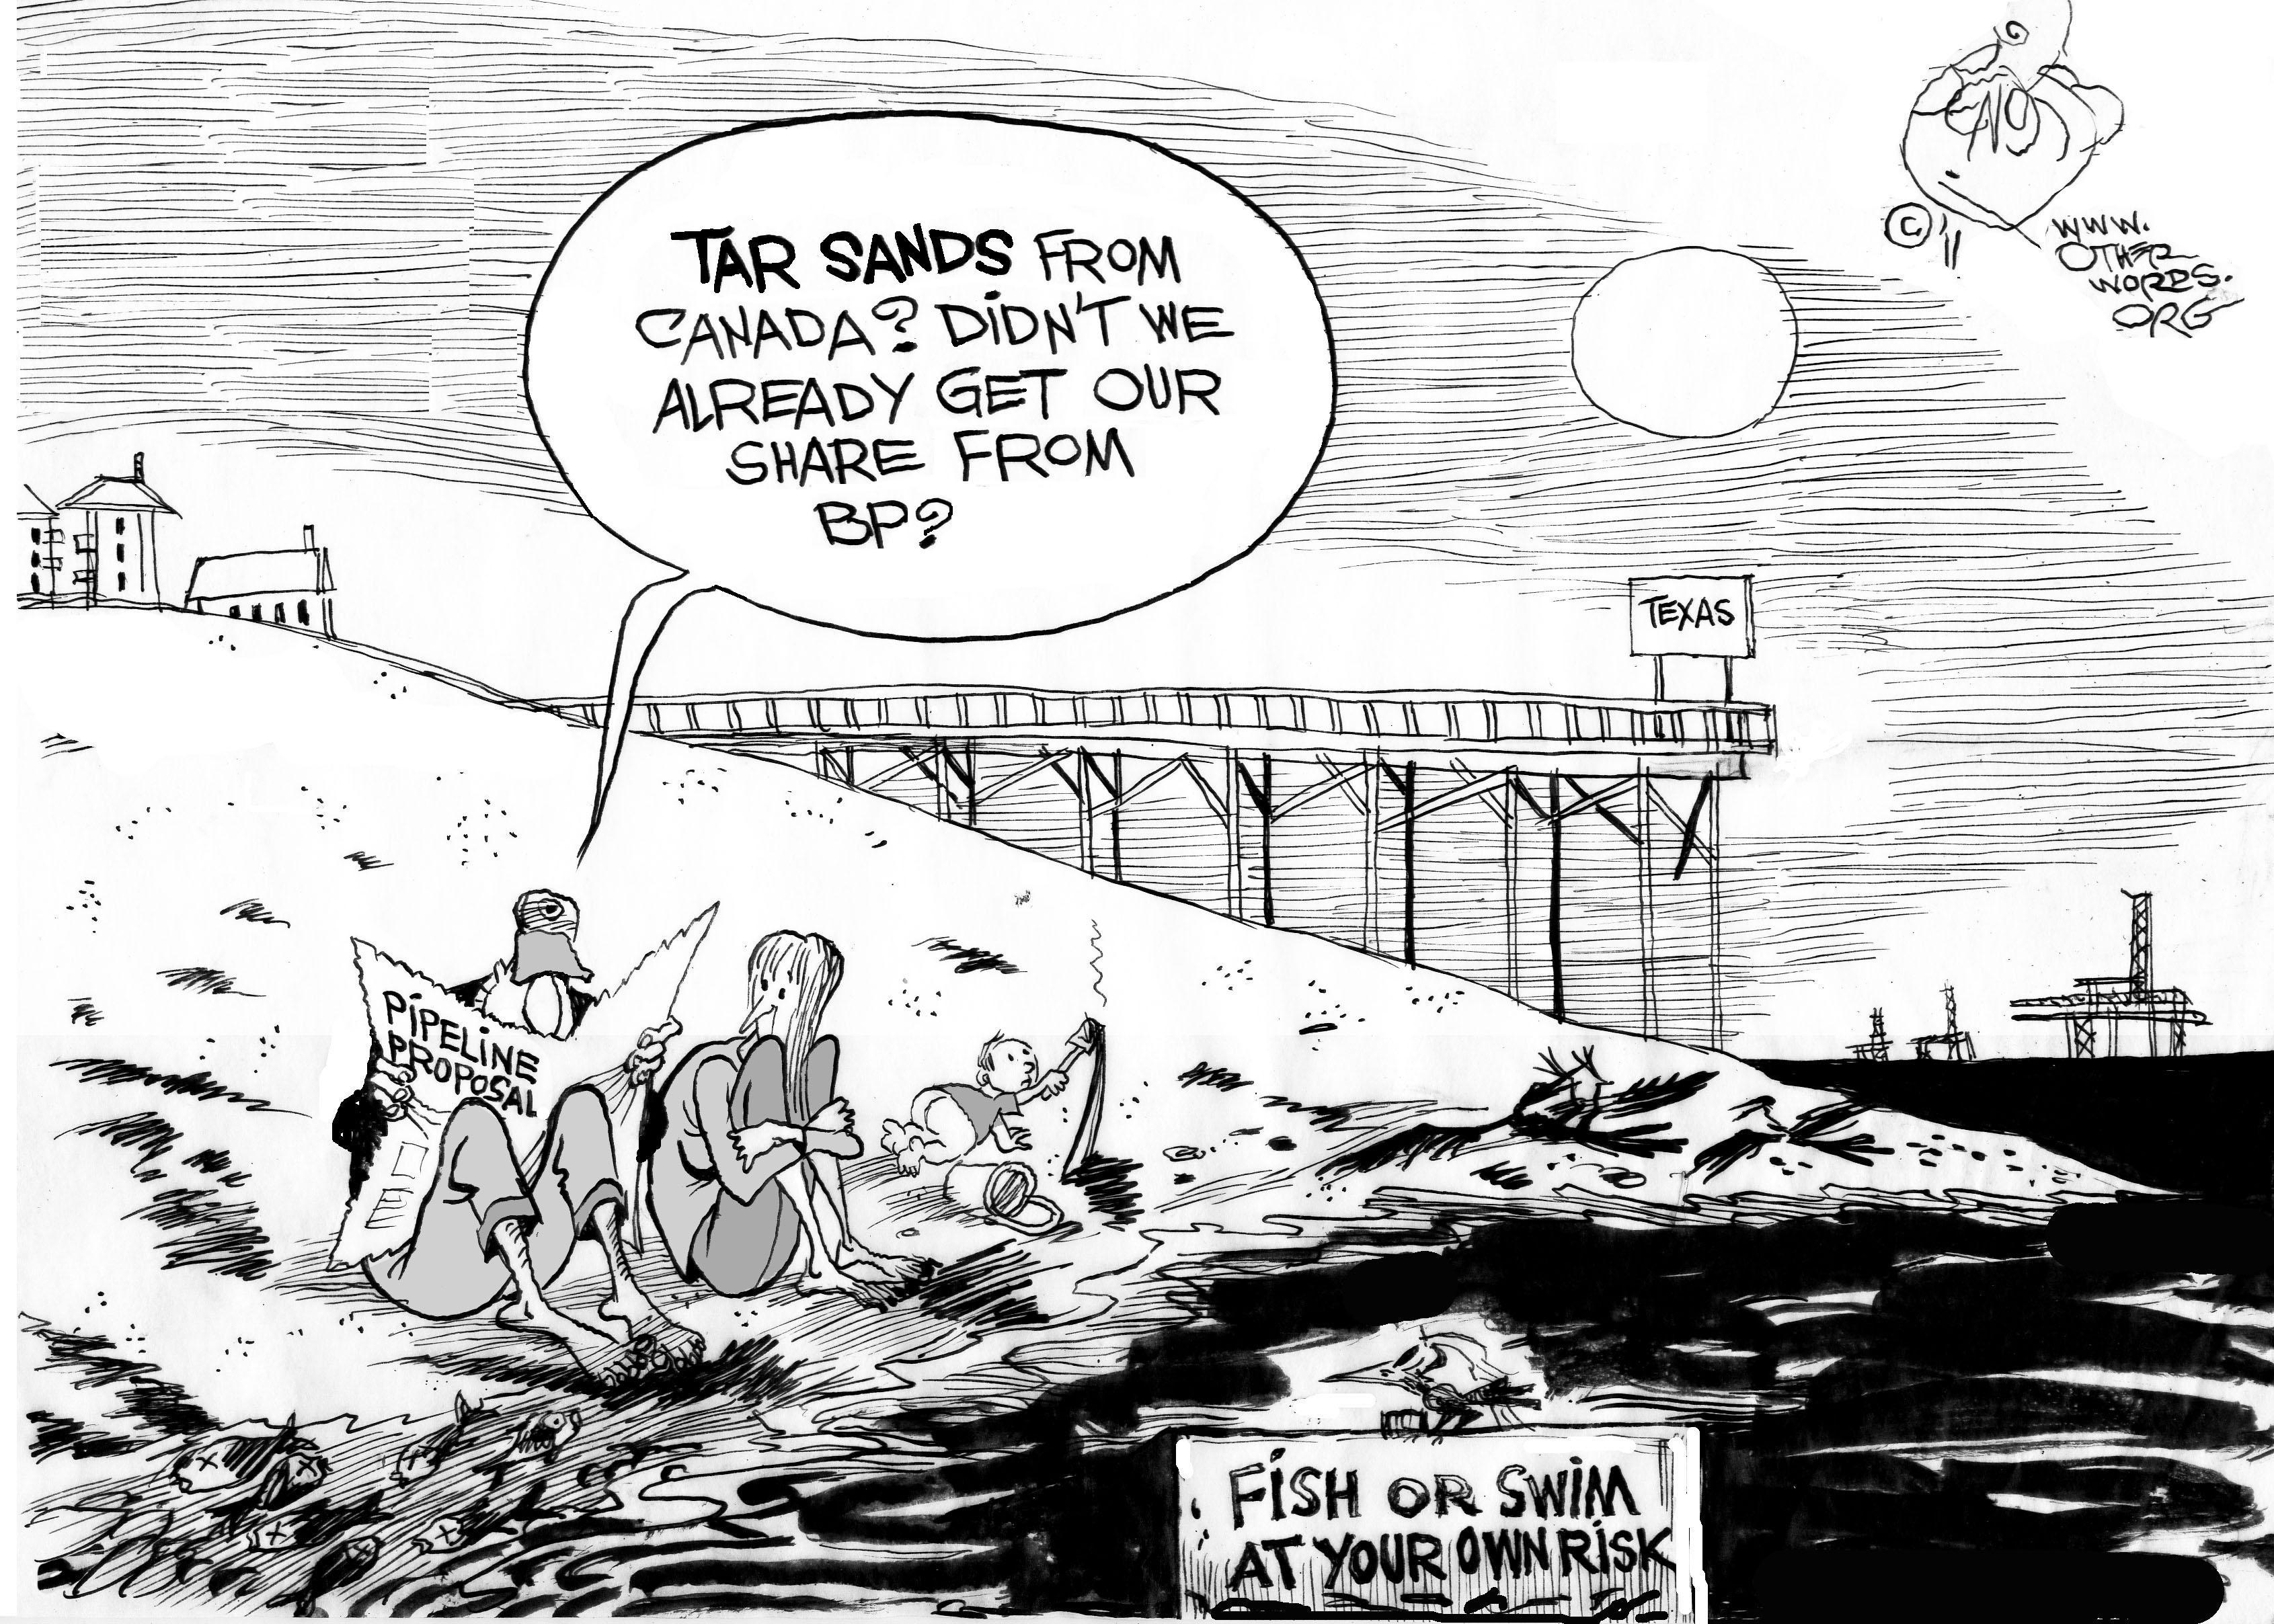 Obama: Reject the Tar Sands Pipeline